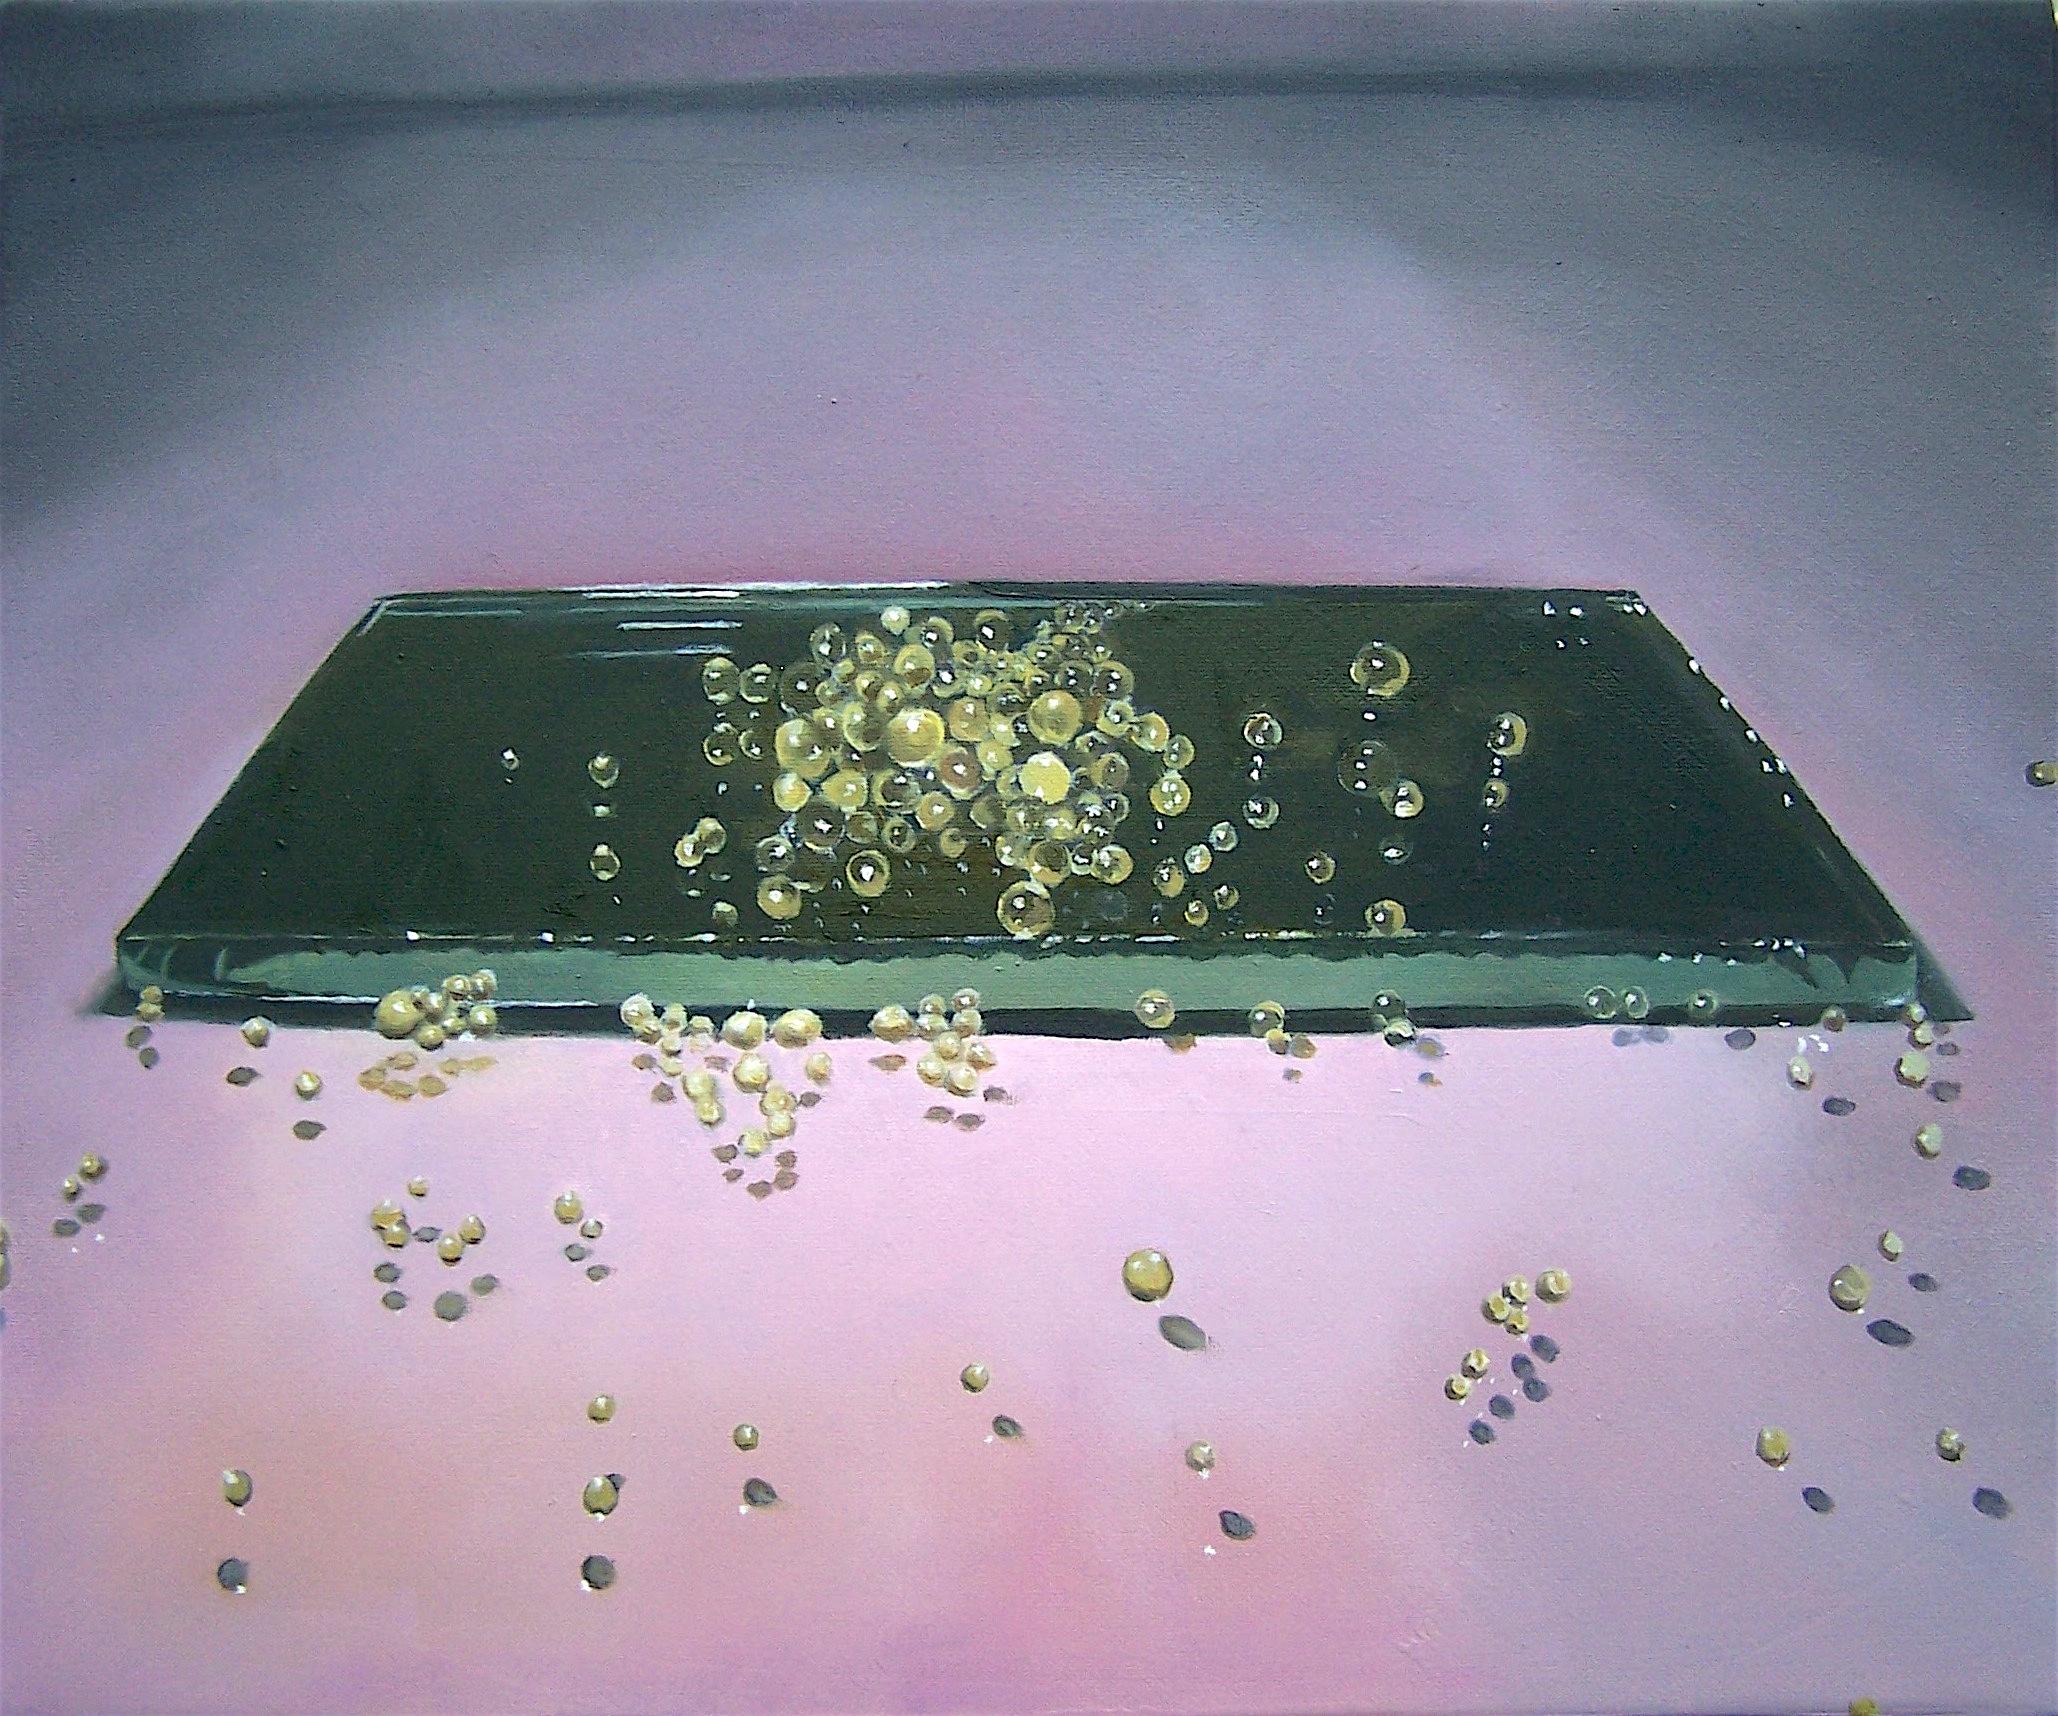 5.-Parallel-Universe__oil-on-canvas_25x30cm_myrajago.jpg